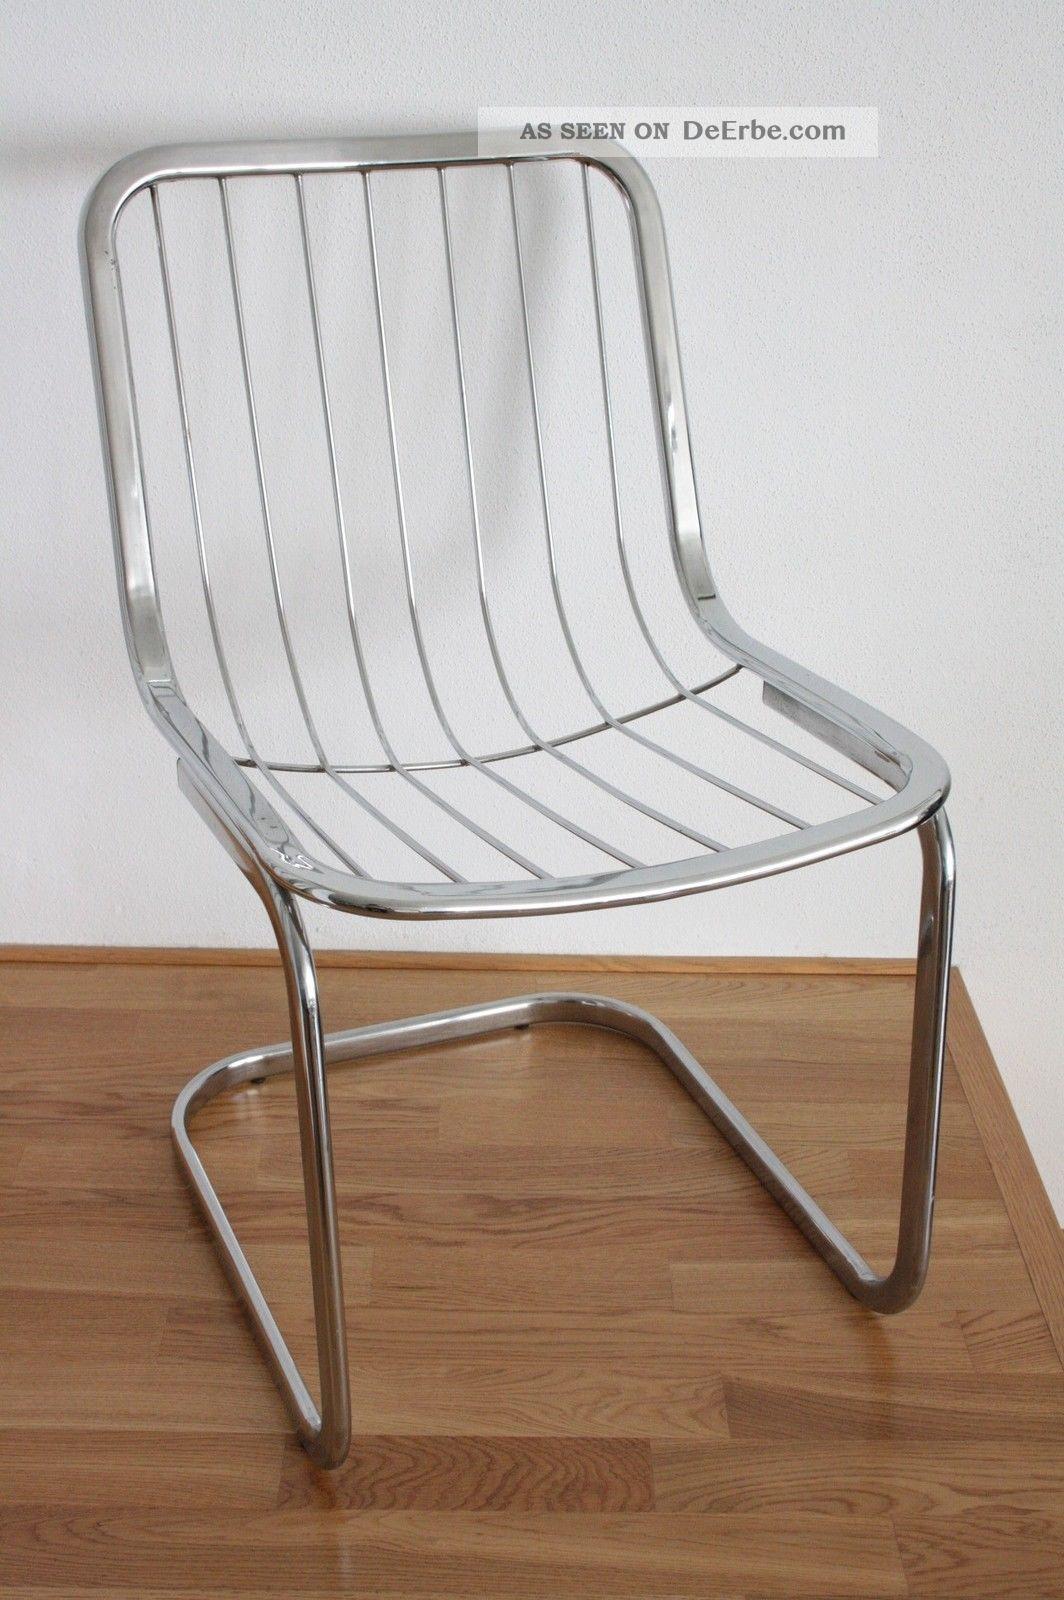 2 Stück Designer Sessel Freischwinger ära Bauhaus Design